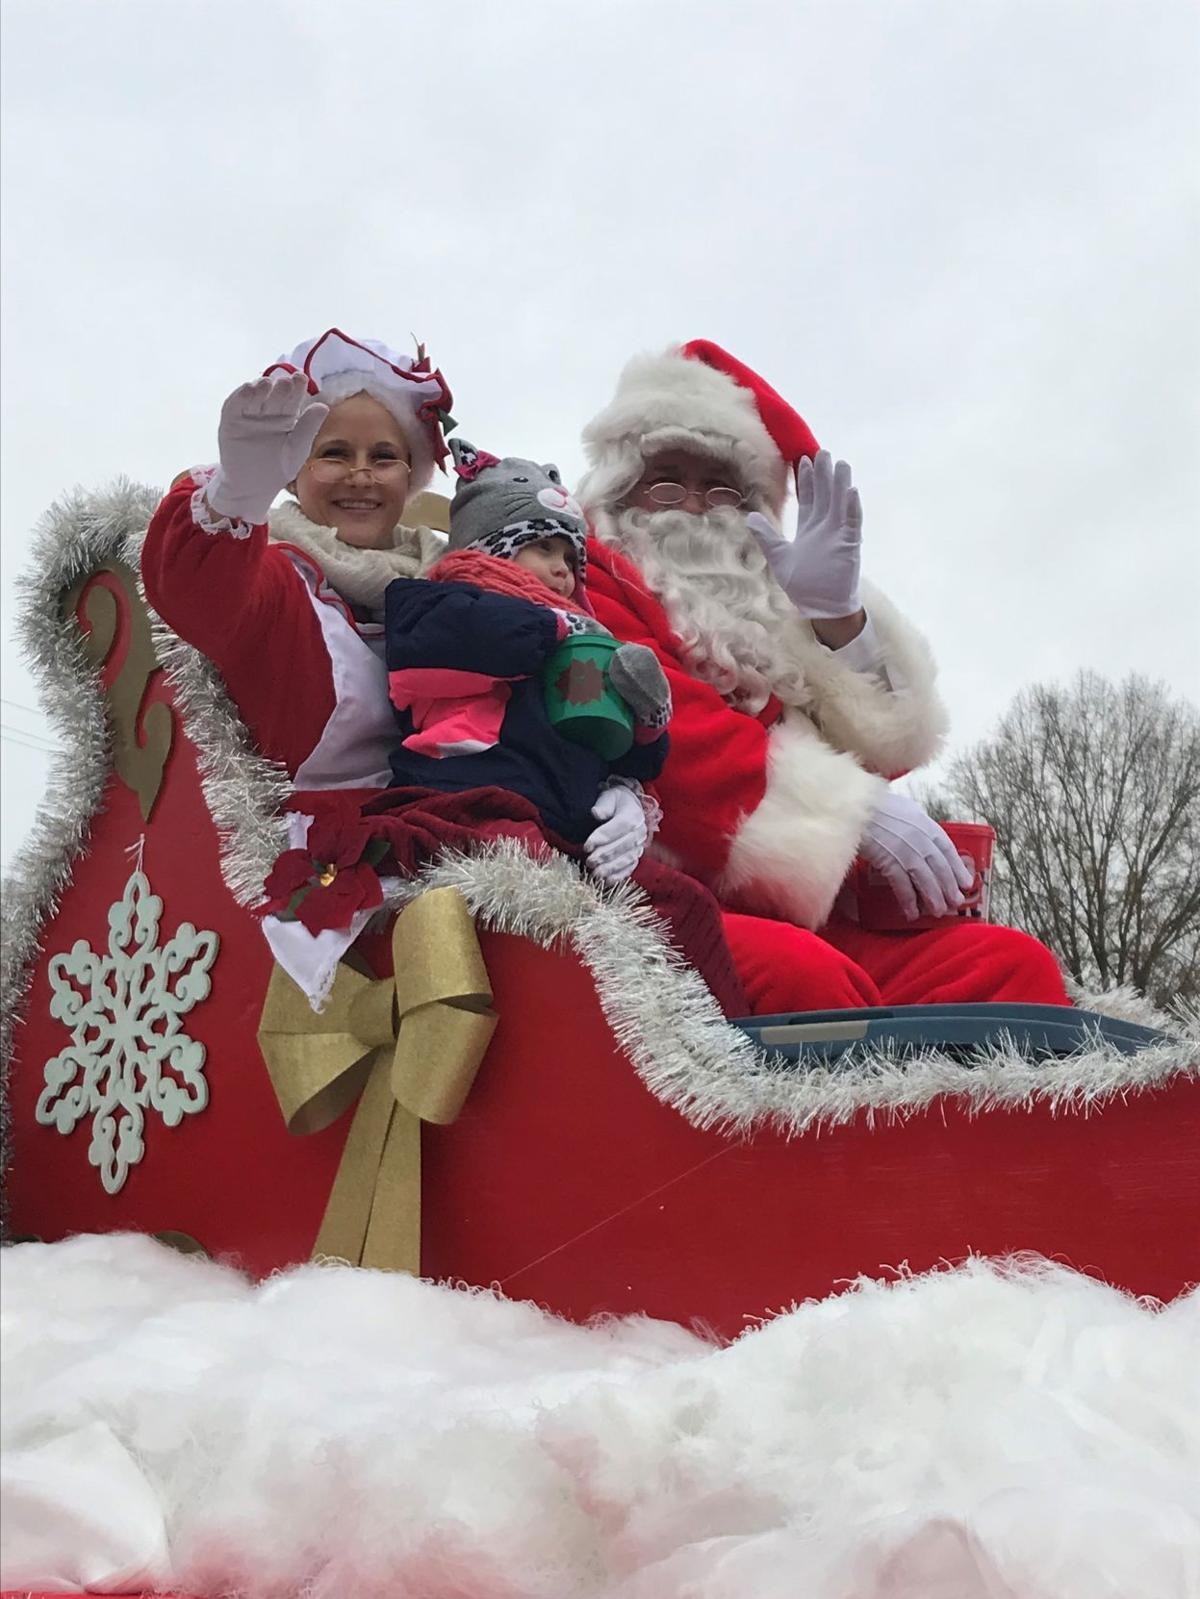 Madison Nc Christmas Parade 2021 Photos Madison Mayodan Christmas Parade Gallery Greensboro Com